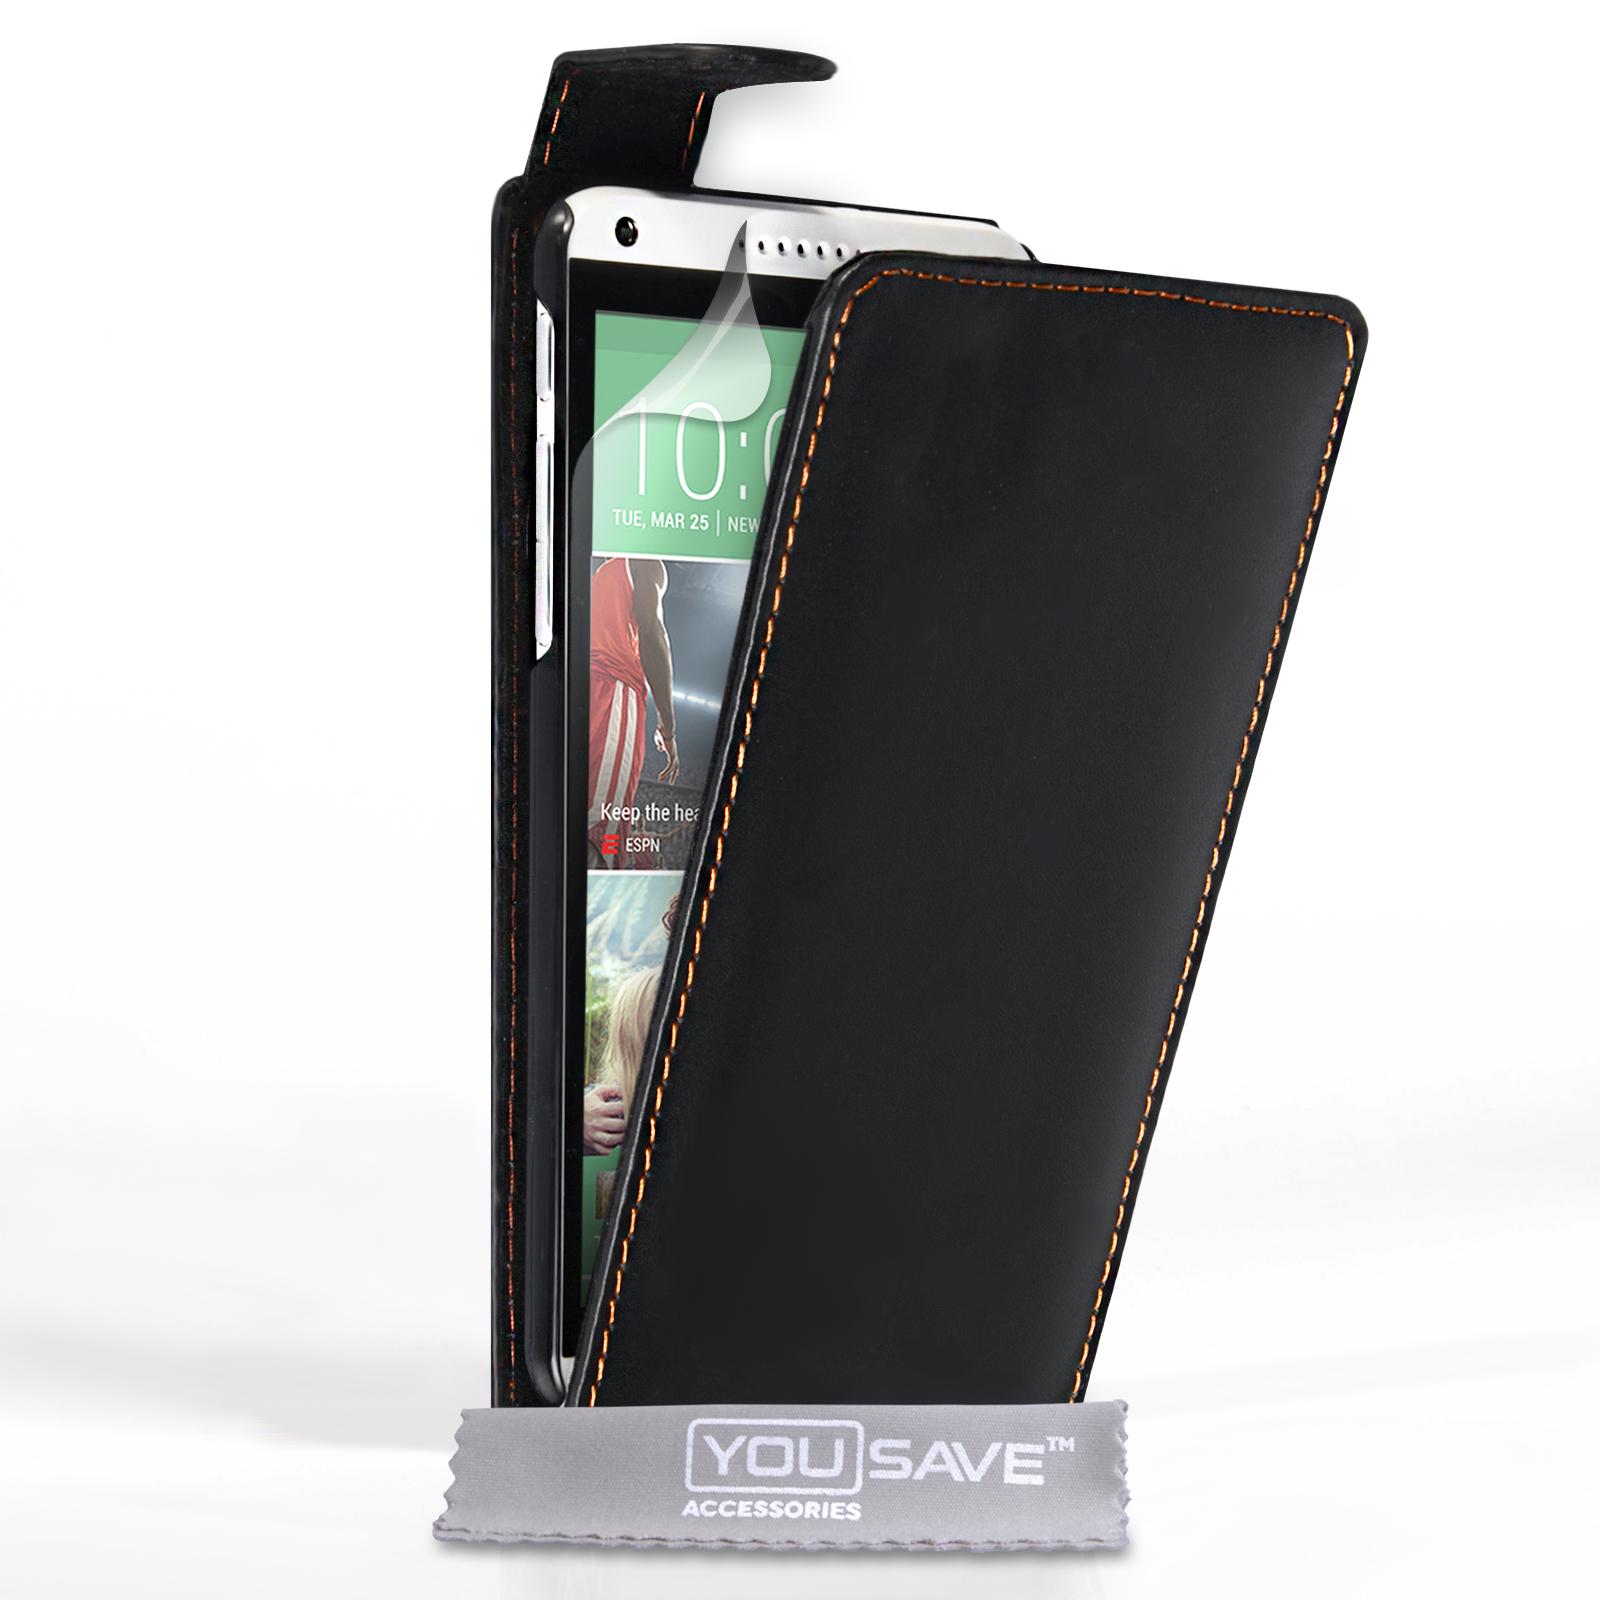 Flip Θήκη HTC Desire 816 by YouSave (Z404)